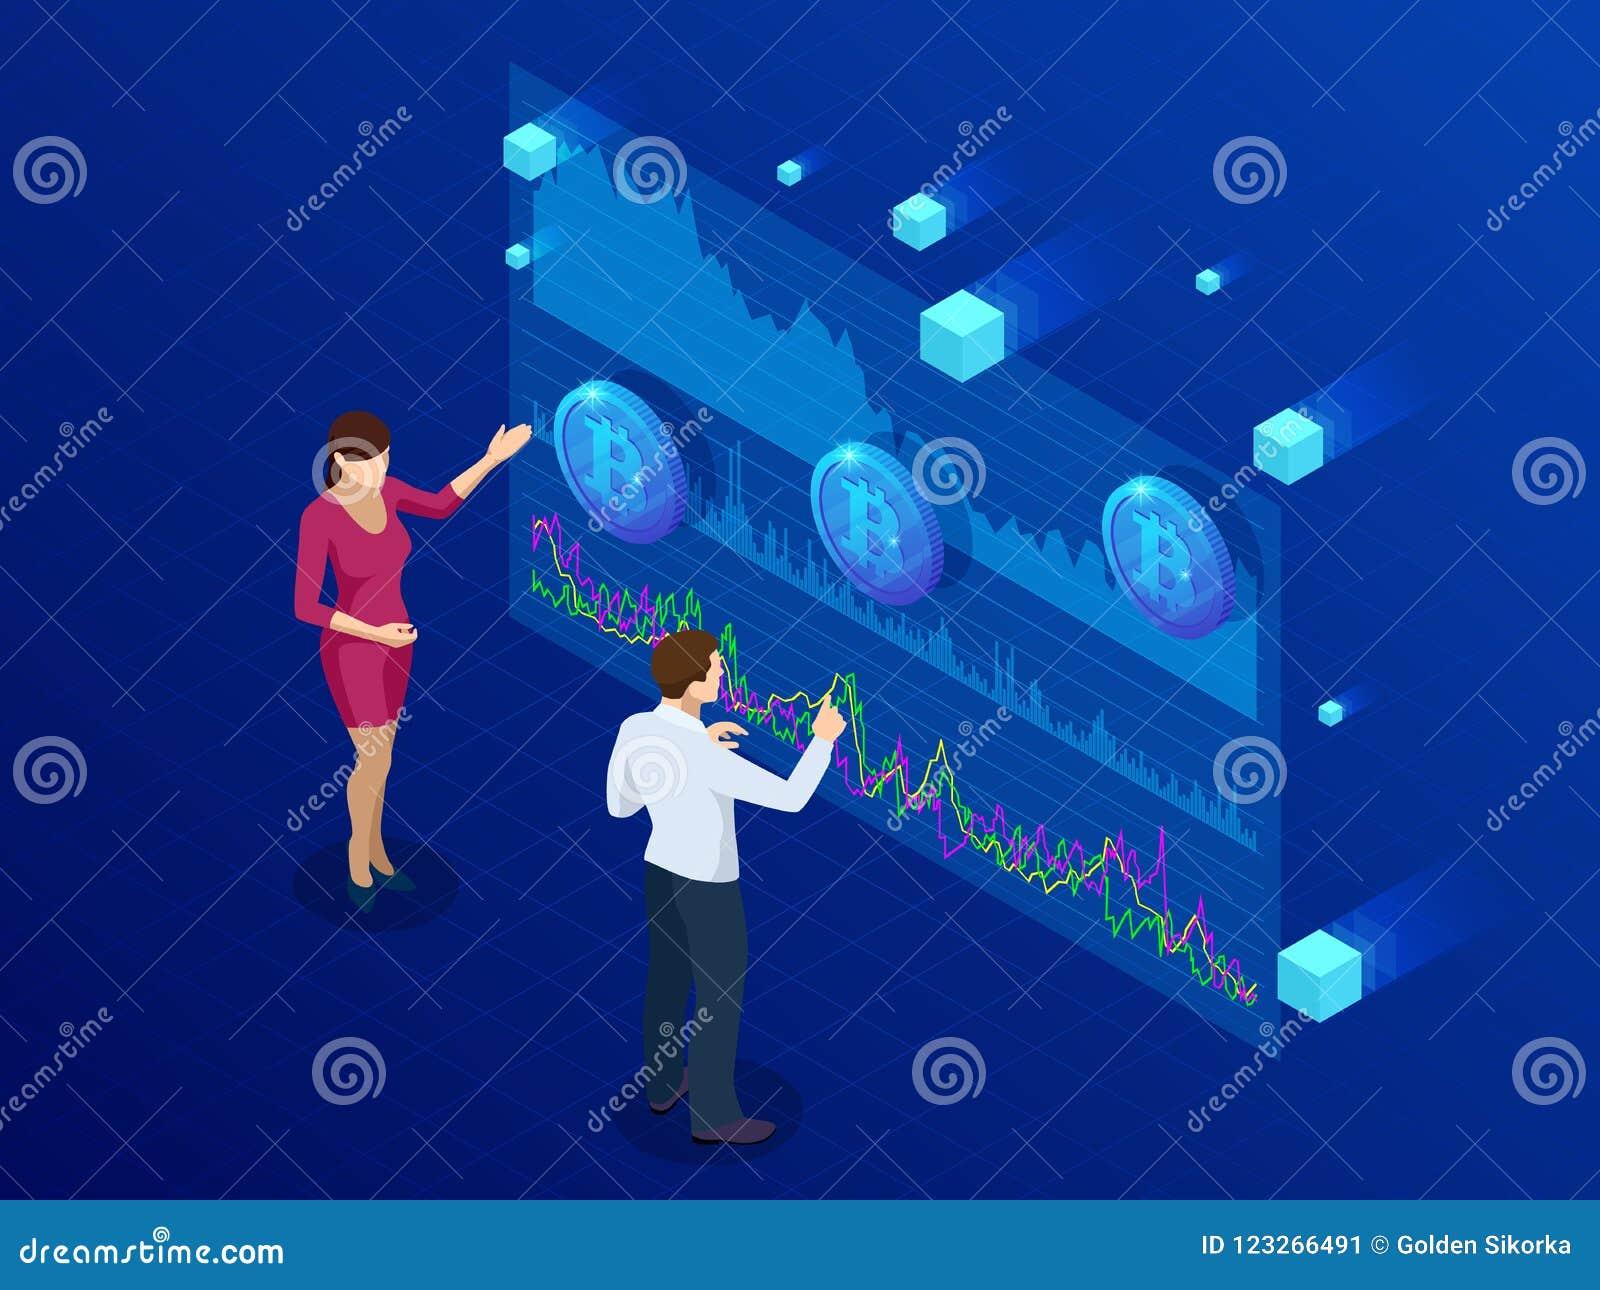 Isometric επιχειρηματίας και επιχειρηματίας που αναλύουν ένα analytics Bitcoin, ταμπλό νοημοσύνης, στοιχεία Bitcoin διαδικασιών